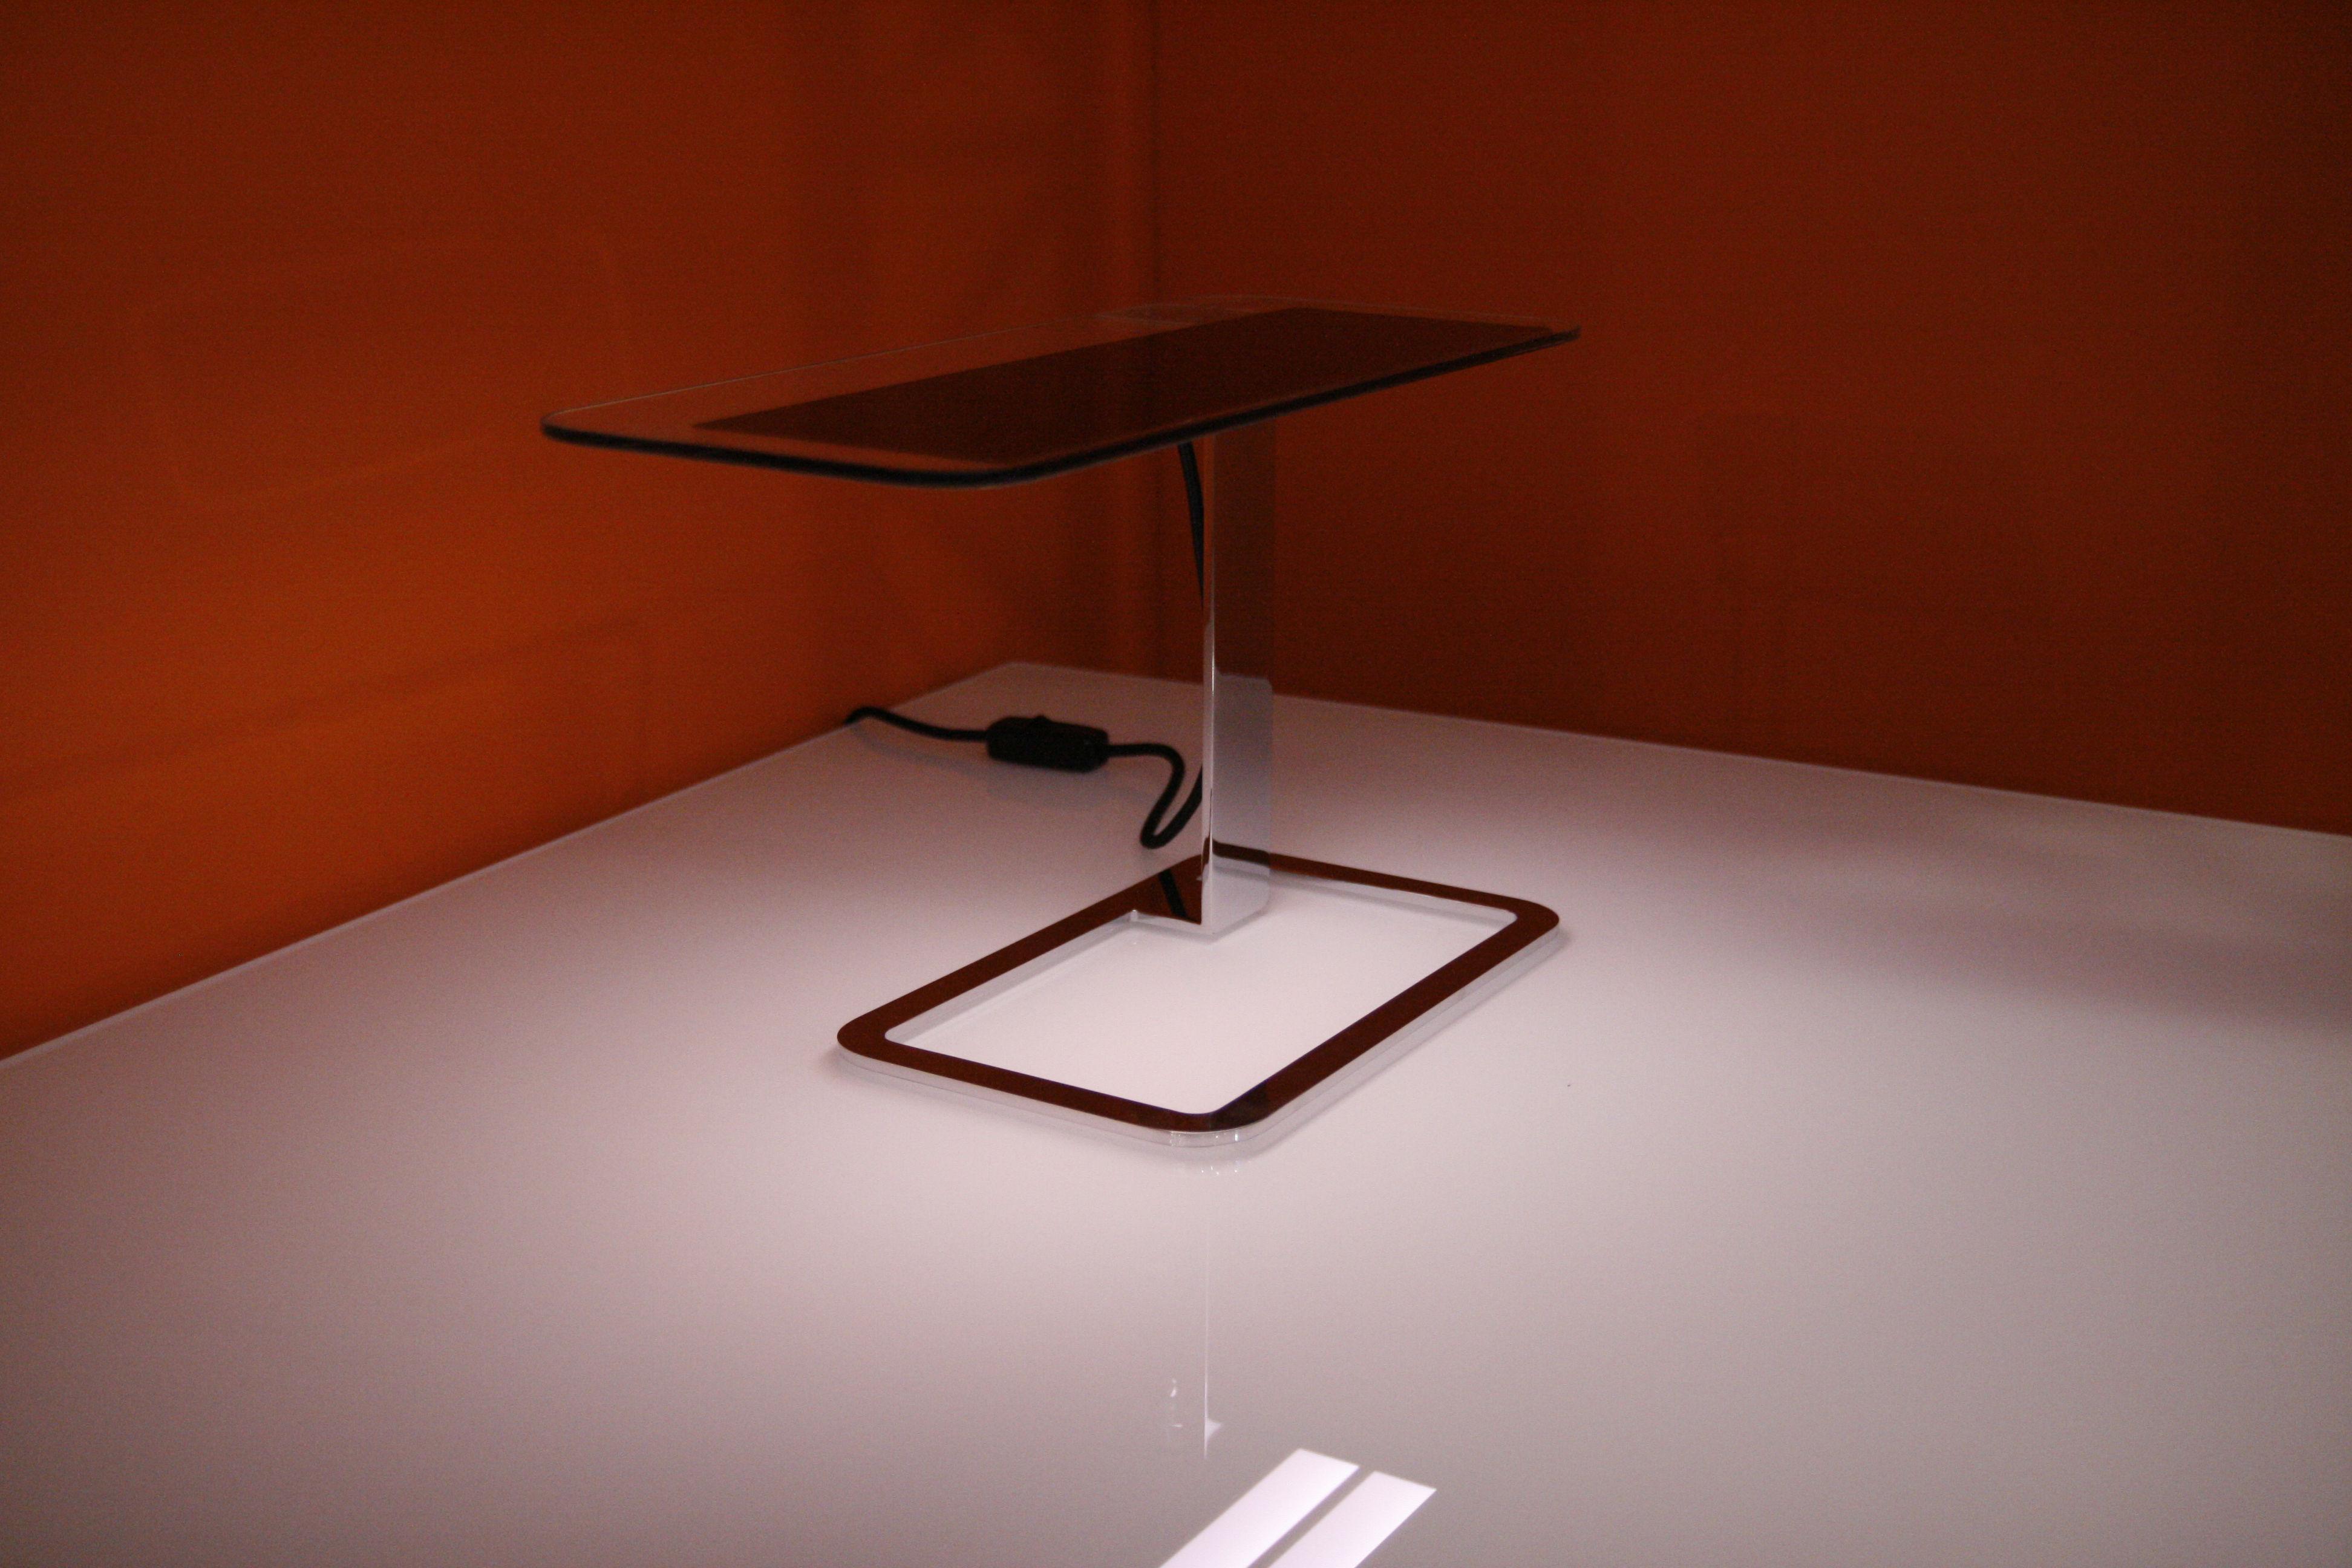 lampe de table ol tecnologia oled by blackbody crhom. Black Bedroom Furniture Sets. Home Design Ideas